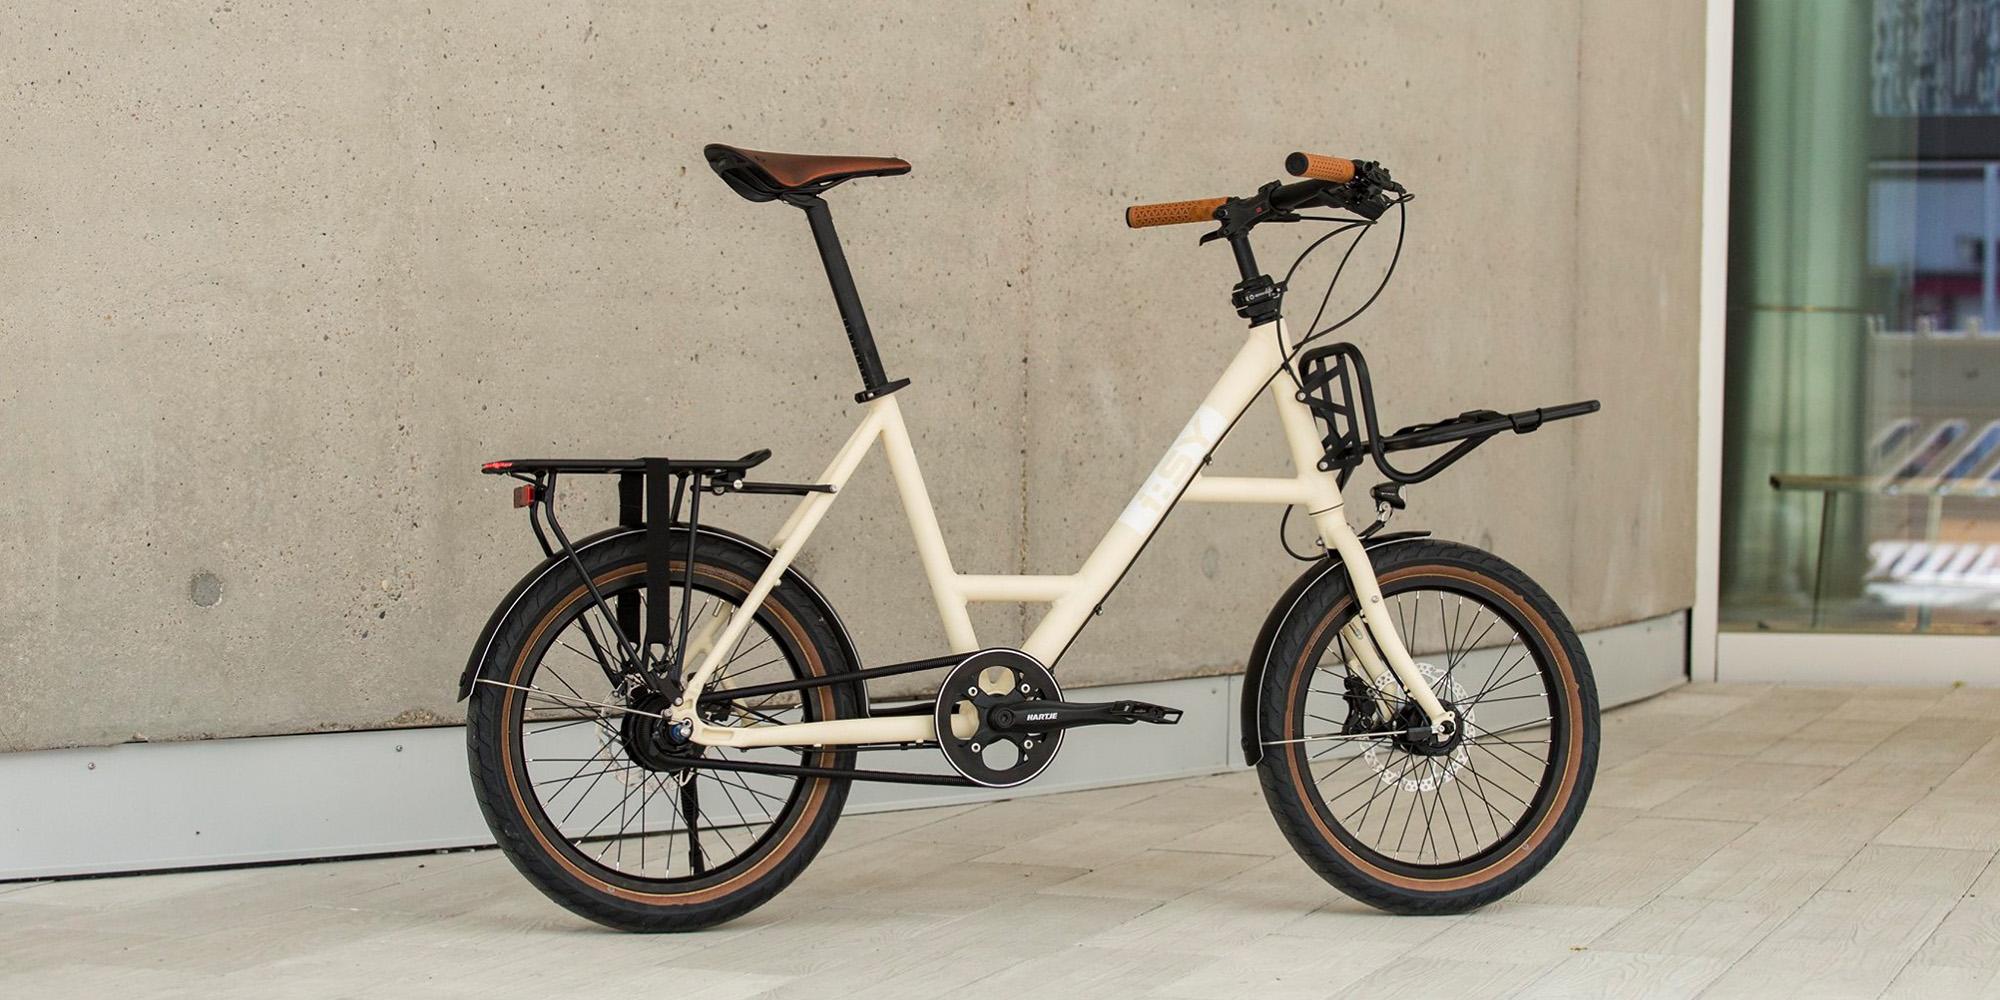 iSY Bike Lite Berlin